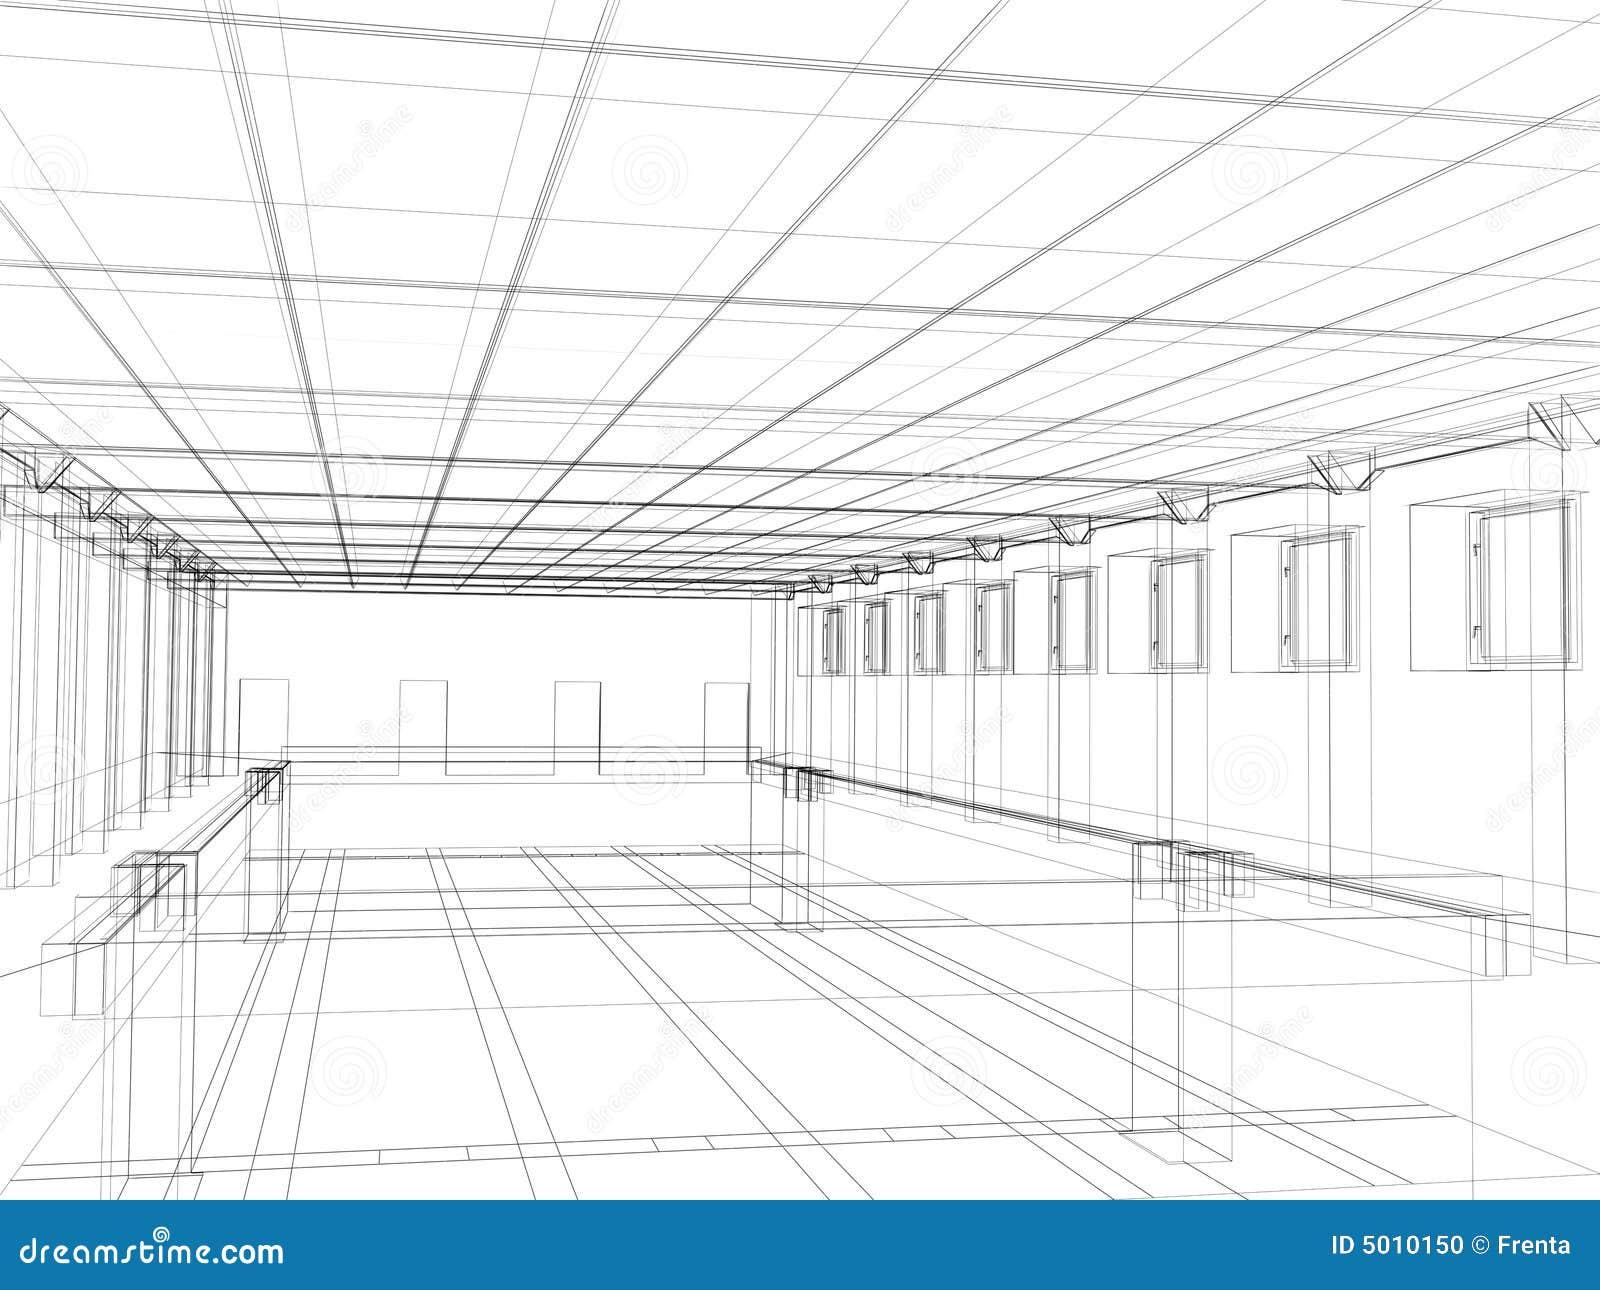 D Sketch Of An Interior Public Building Stock P O